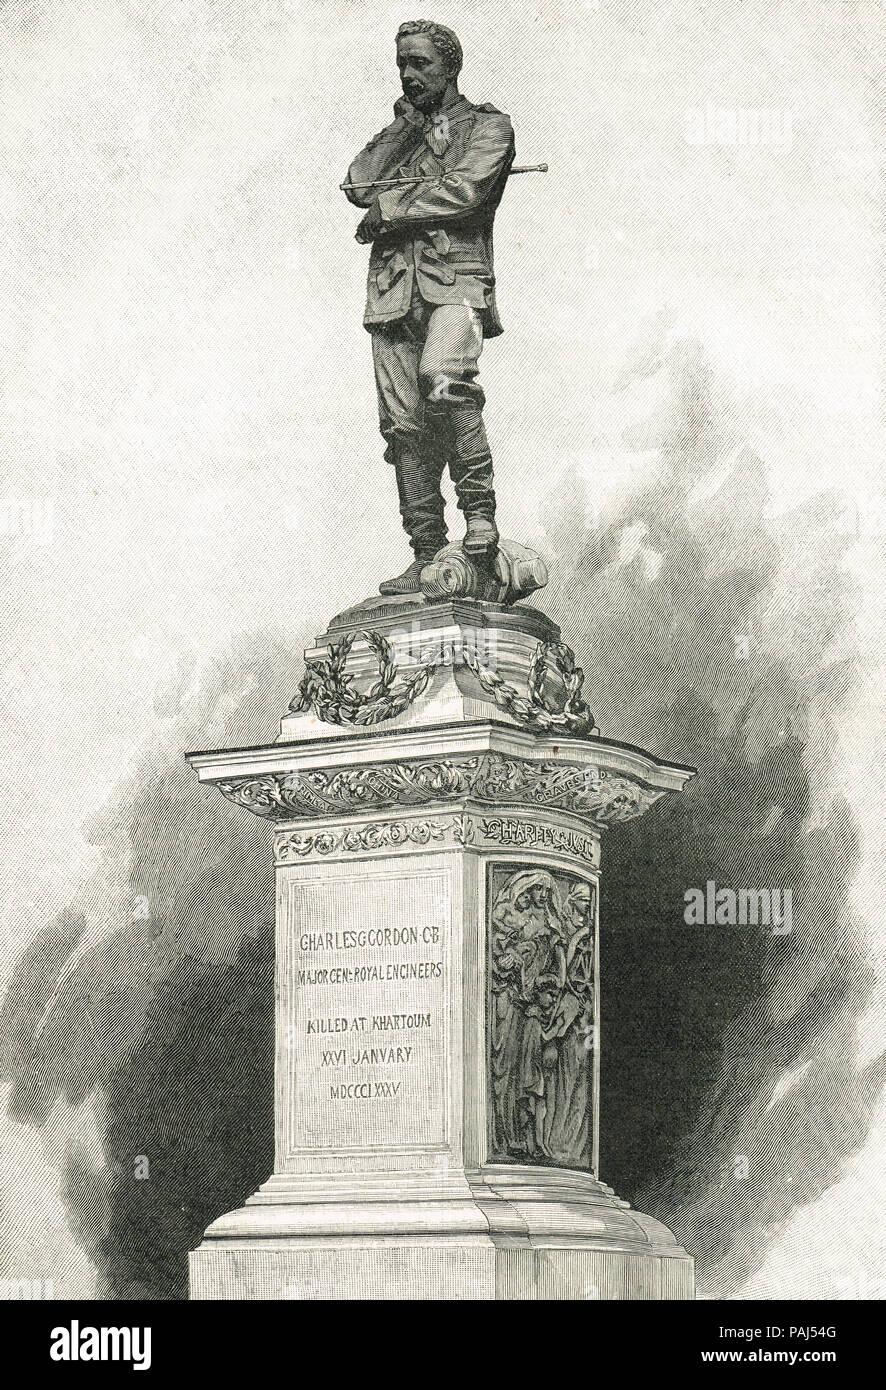 Statue of General Gordon, Gordon of Khartoum, 1833-1885, monument by Sir William Hamo Thornycroft, Trafalgar Square, London, England - Stock Image